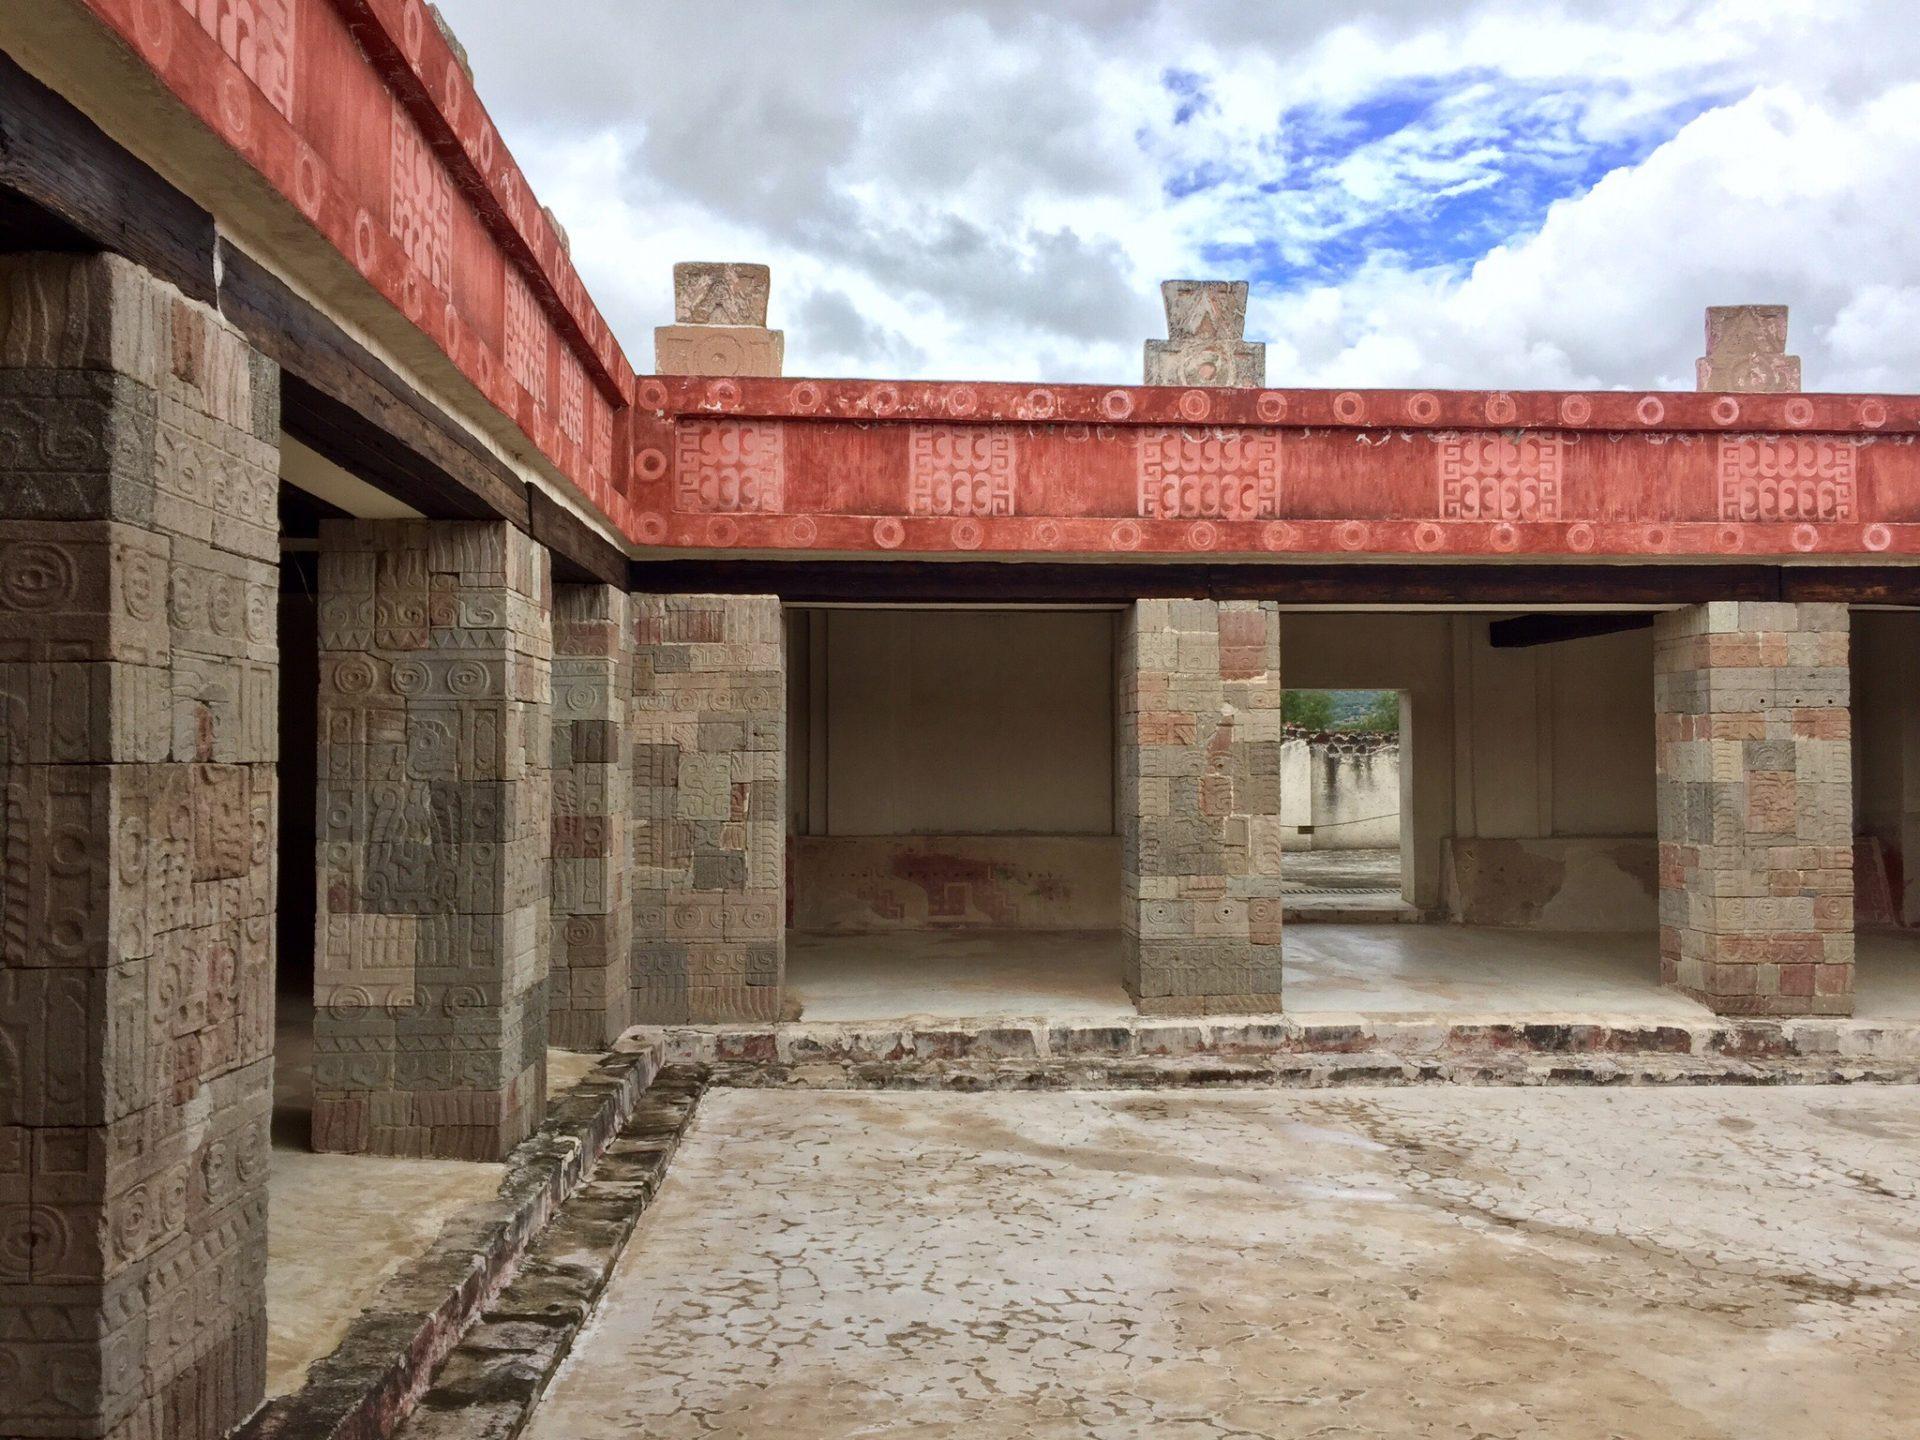 Zonas arqueologicas Teotihuacan